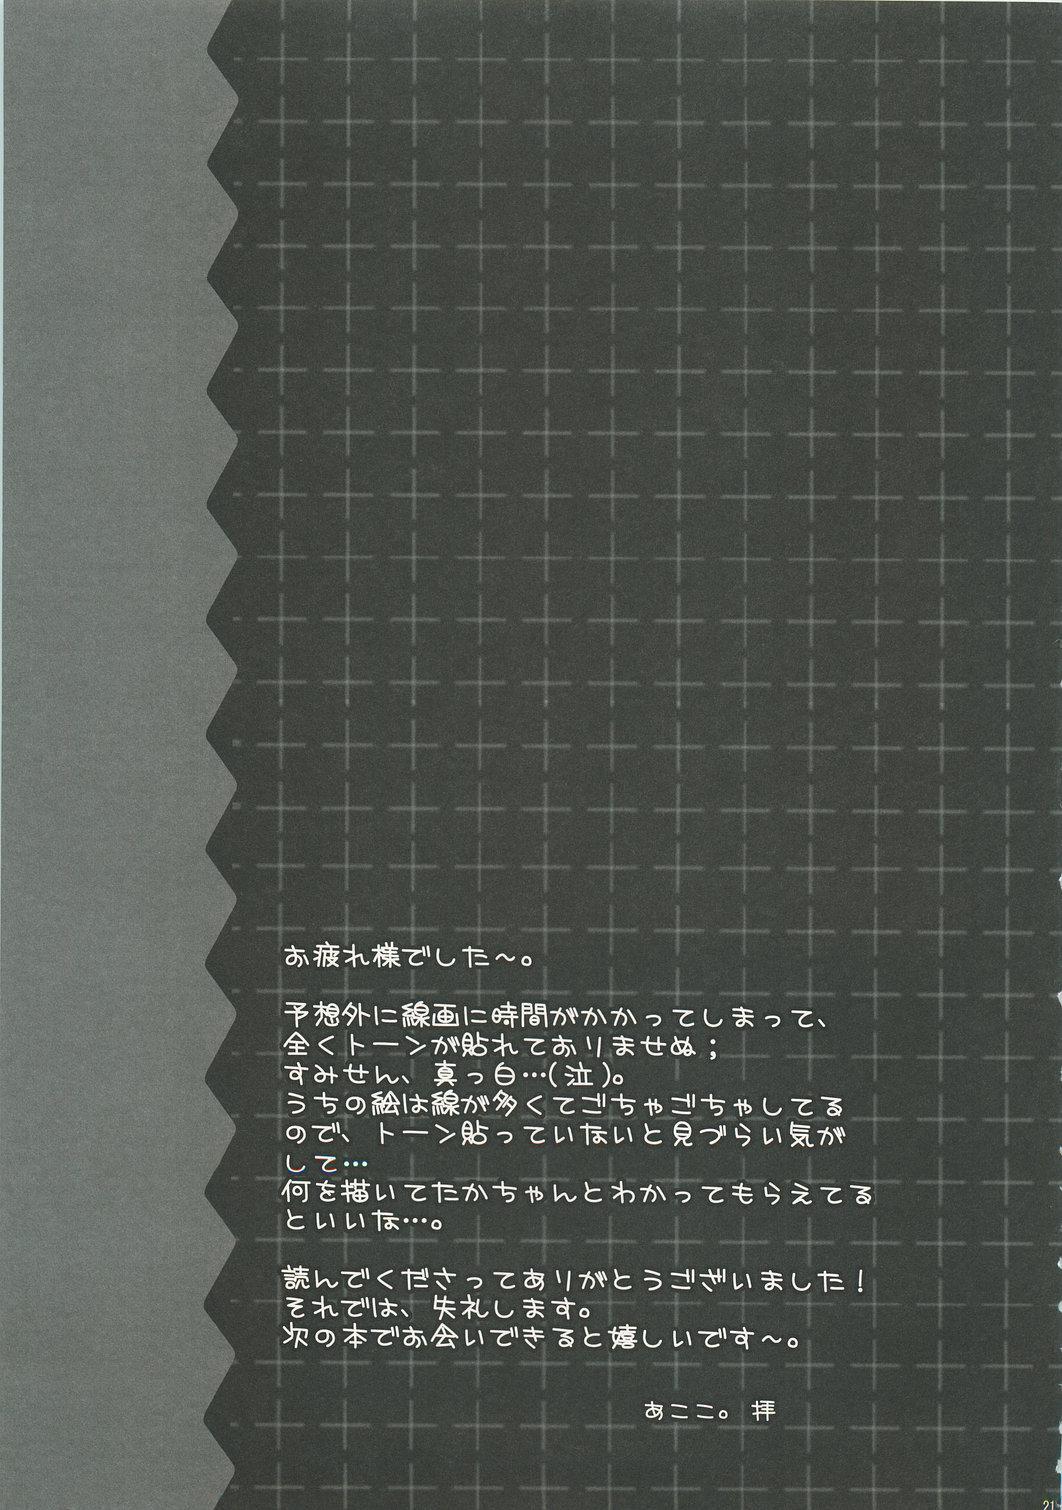 Youkoso, Ura Seitokai e! 19